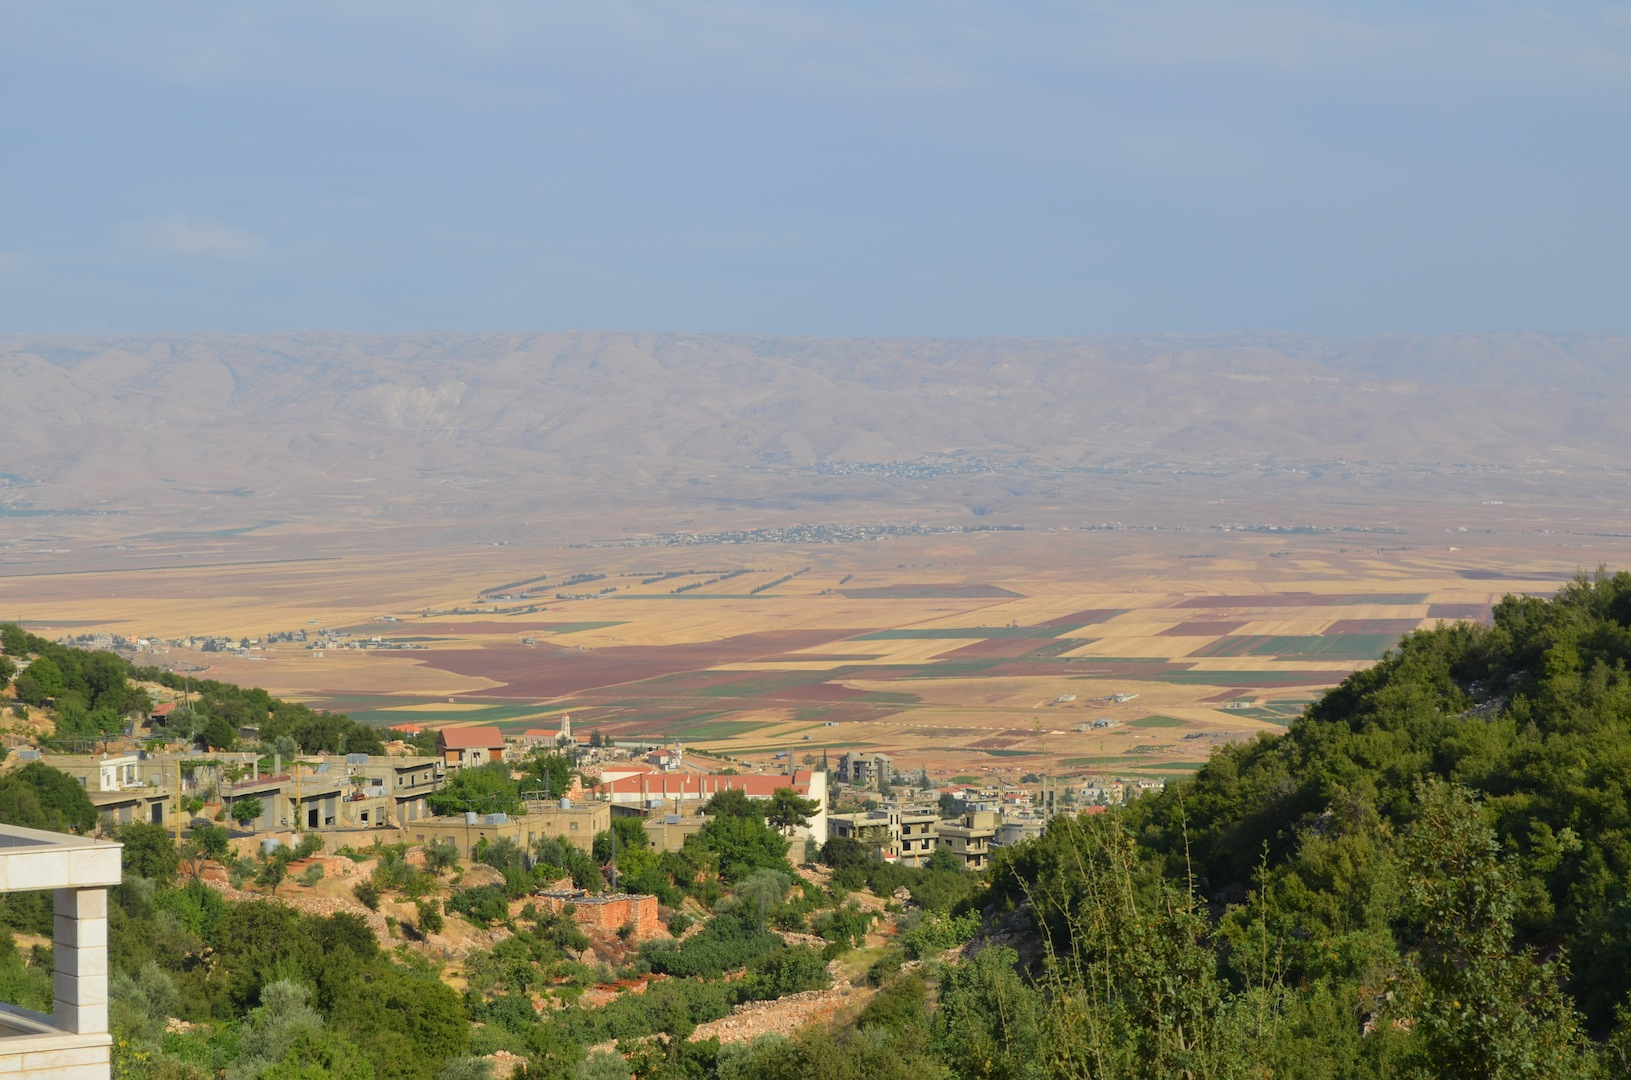 Iphone Wallpaper Cloud Summer In Lebanon A Trip Through The Lebanese Mountains